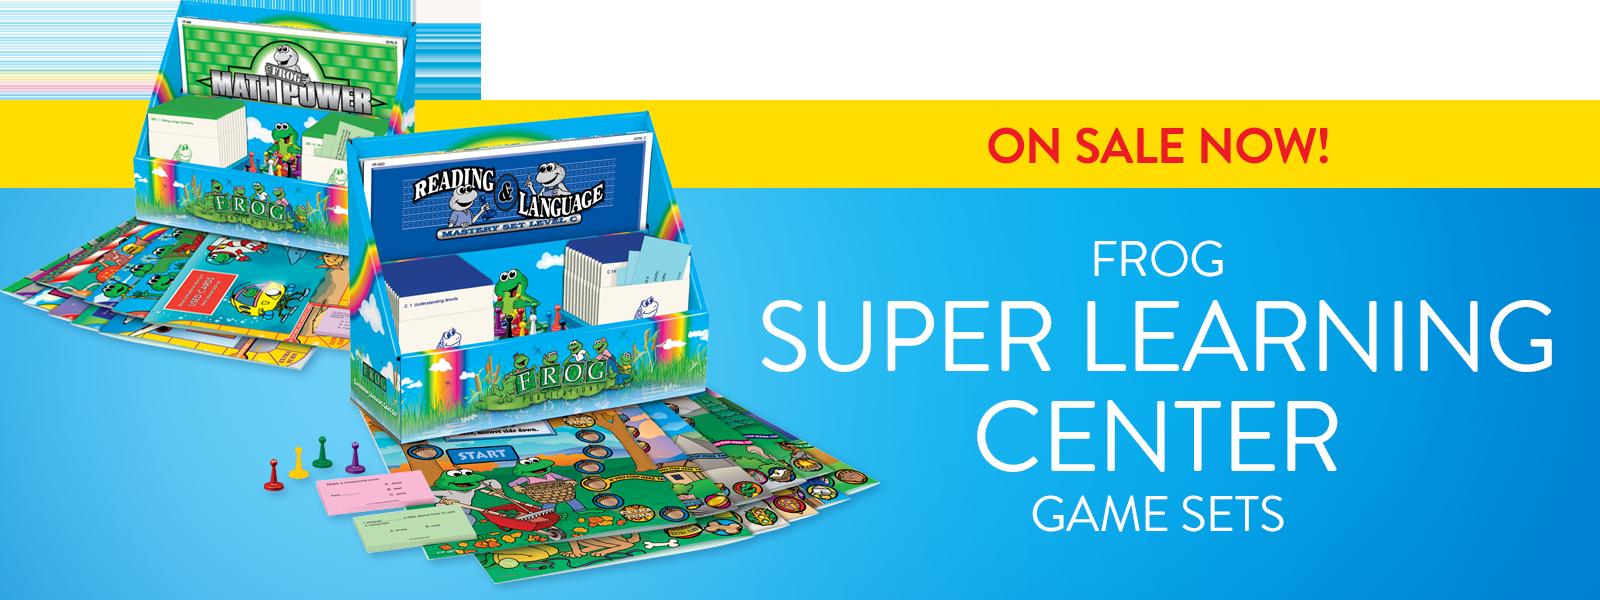 frog-super-learning-center-game-sets-on-sale-now.png